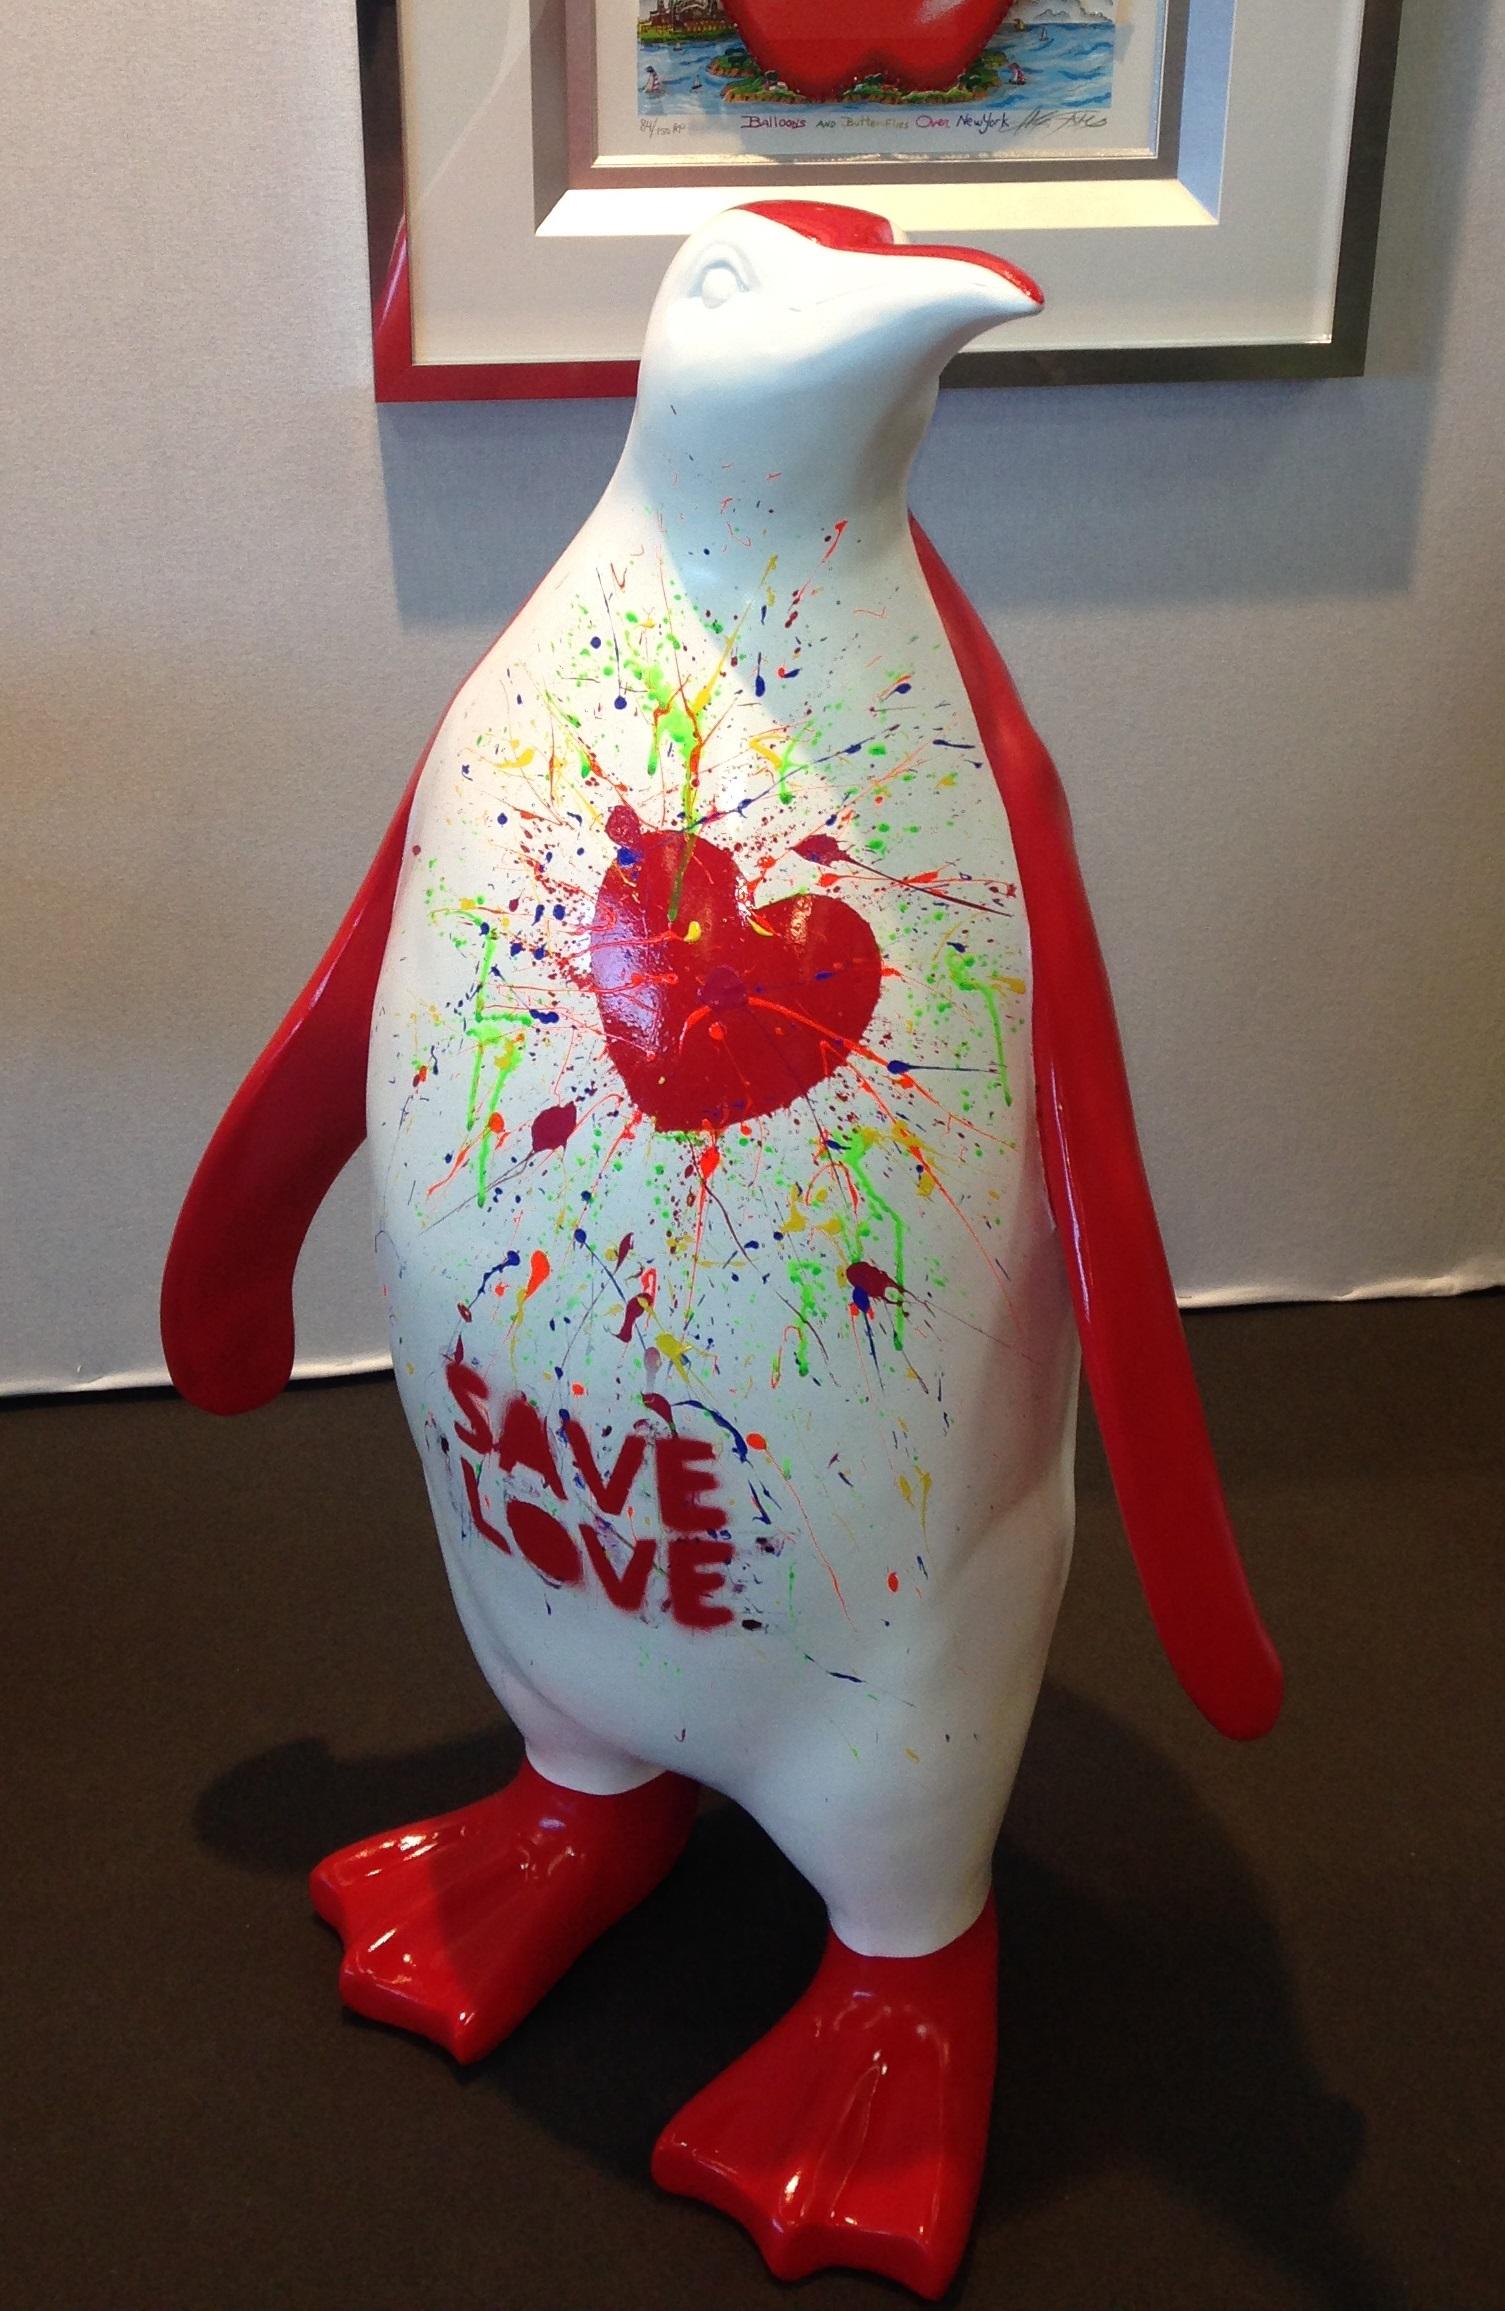 SAVE LOVE 100X66X43CM